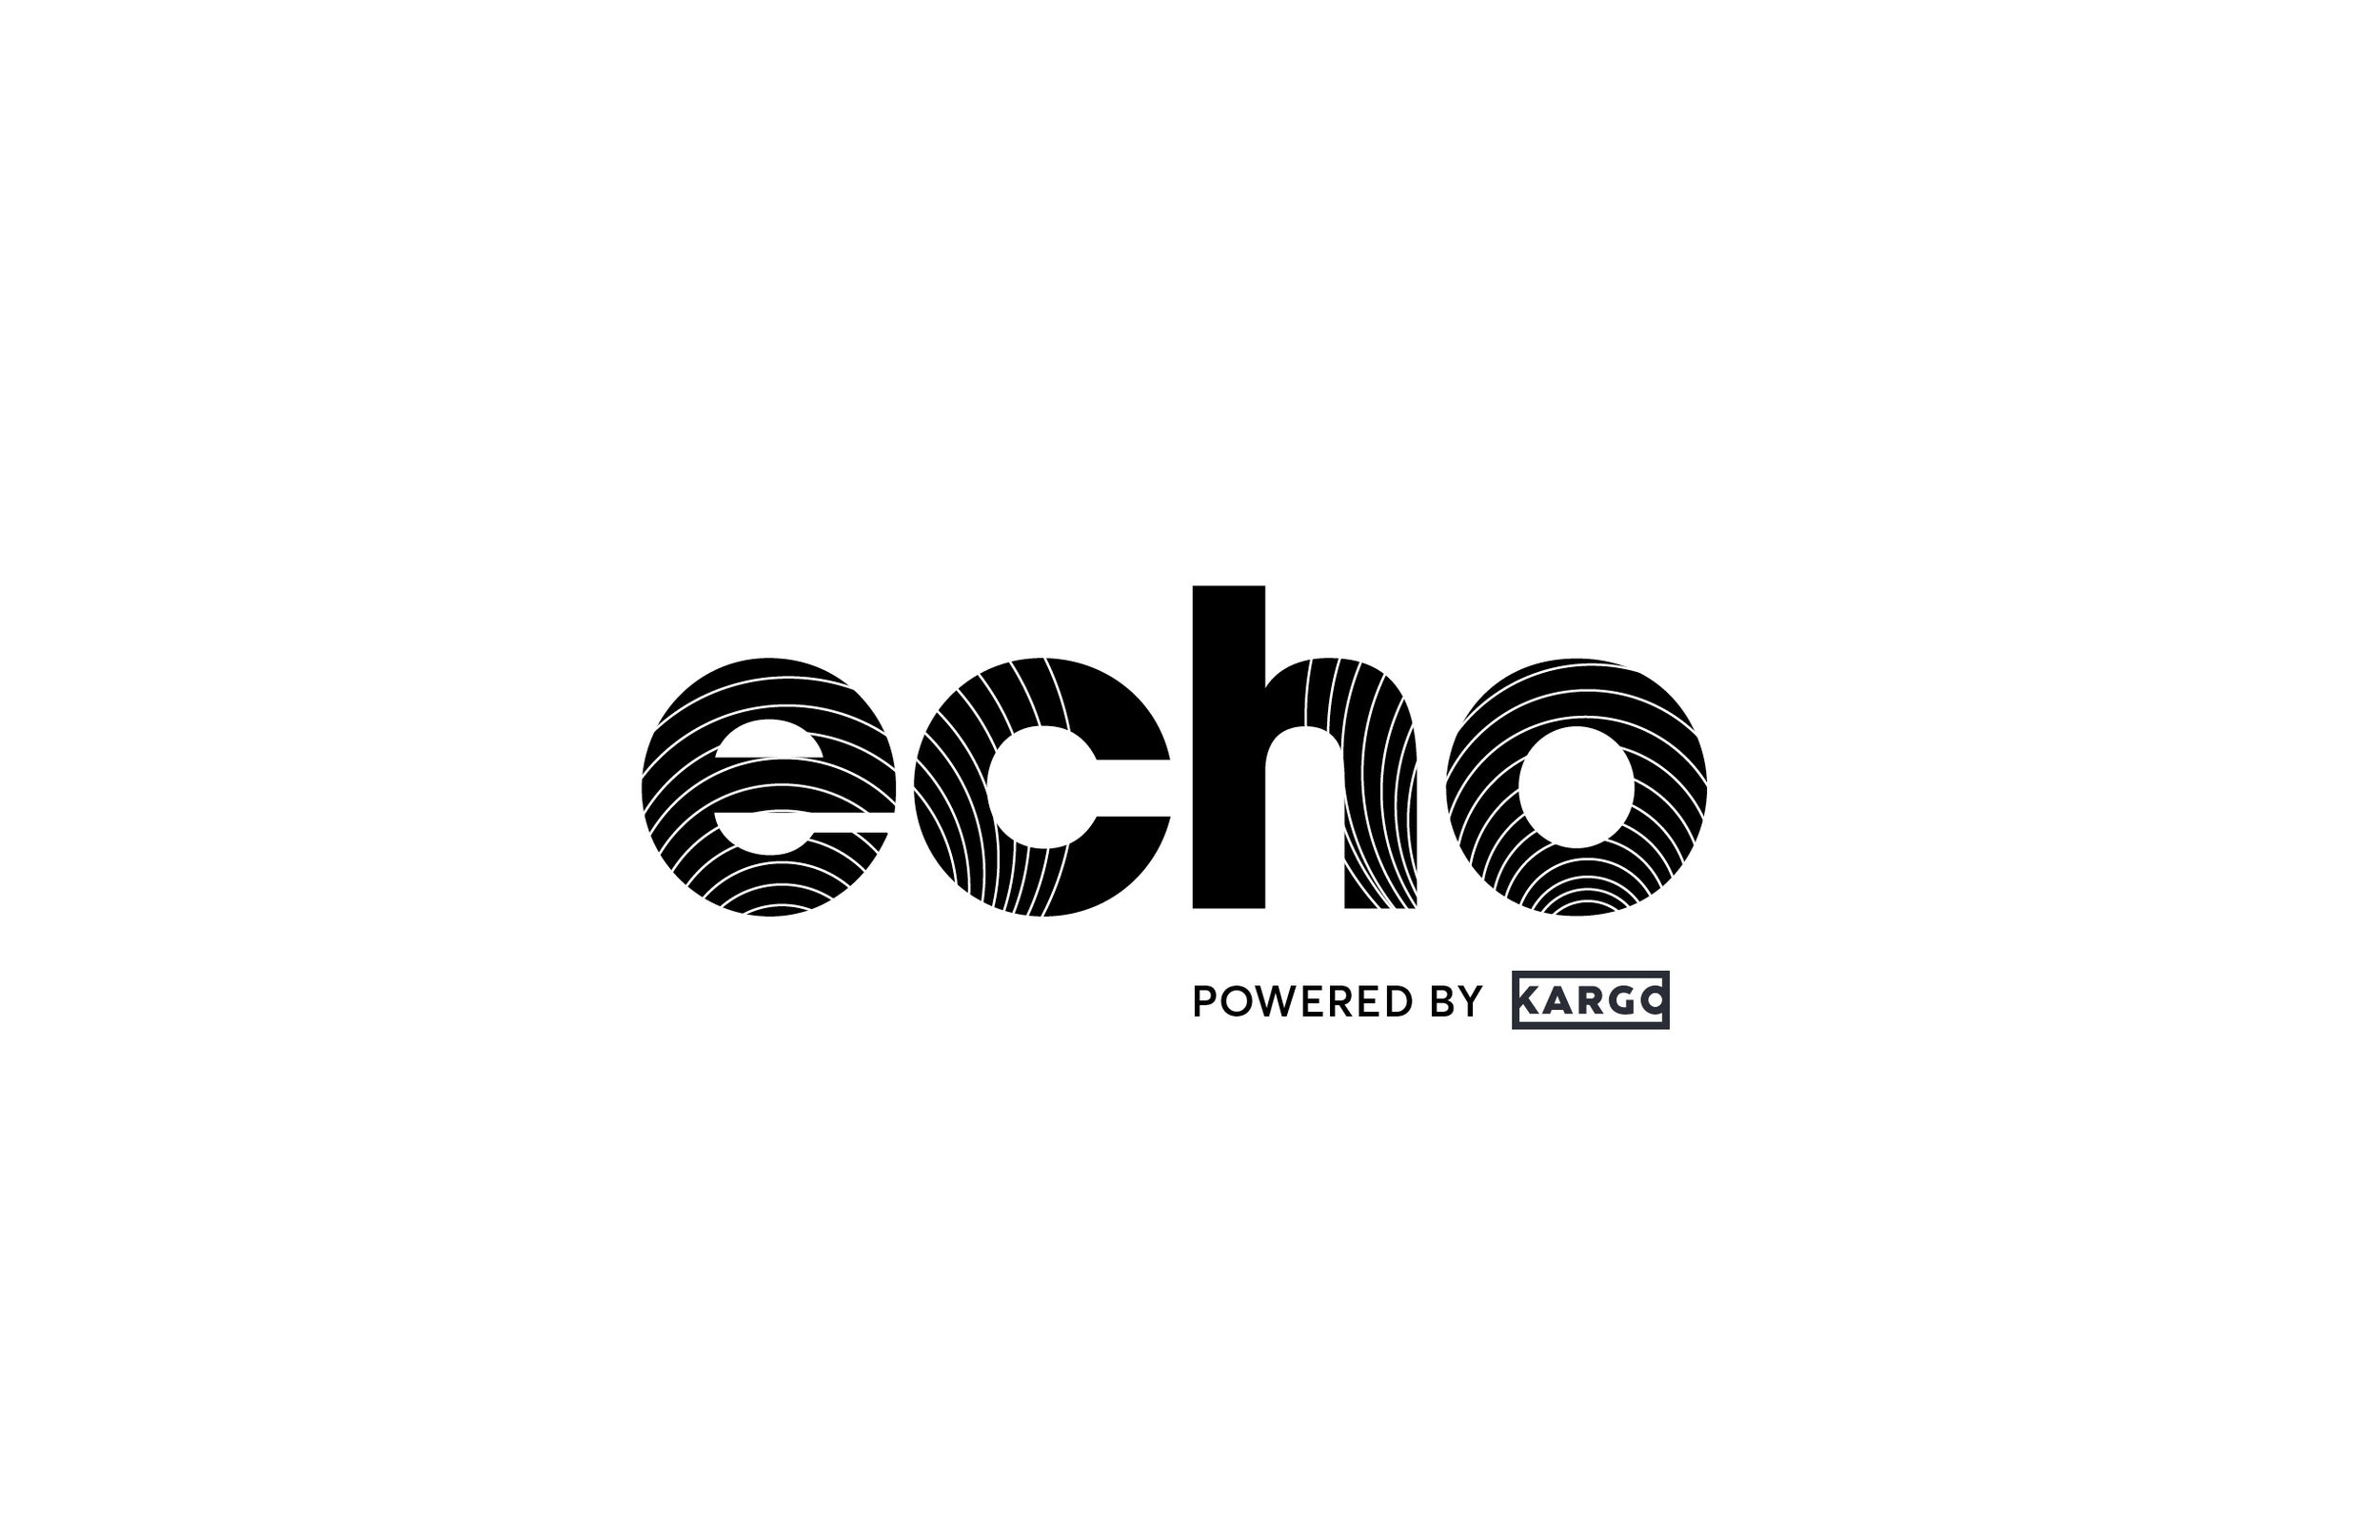 echo logos5.jpg